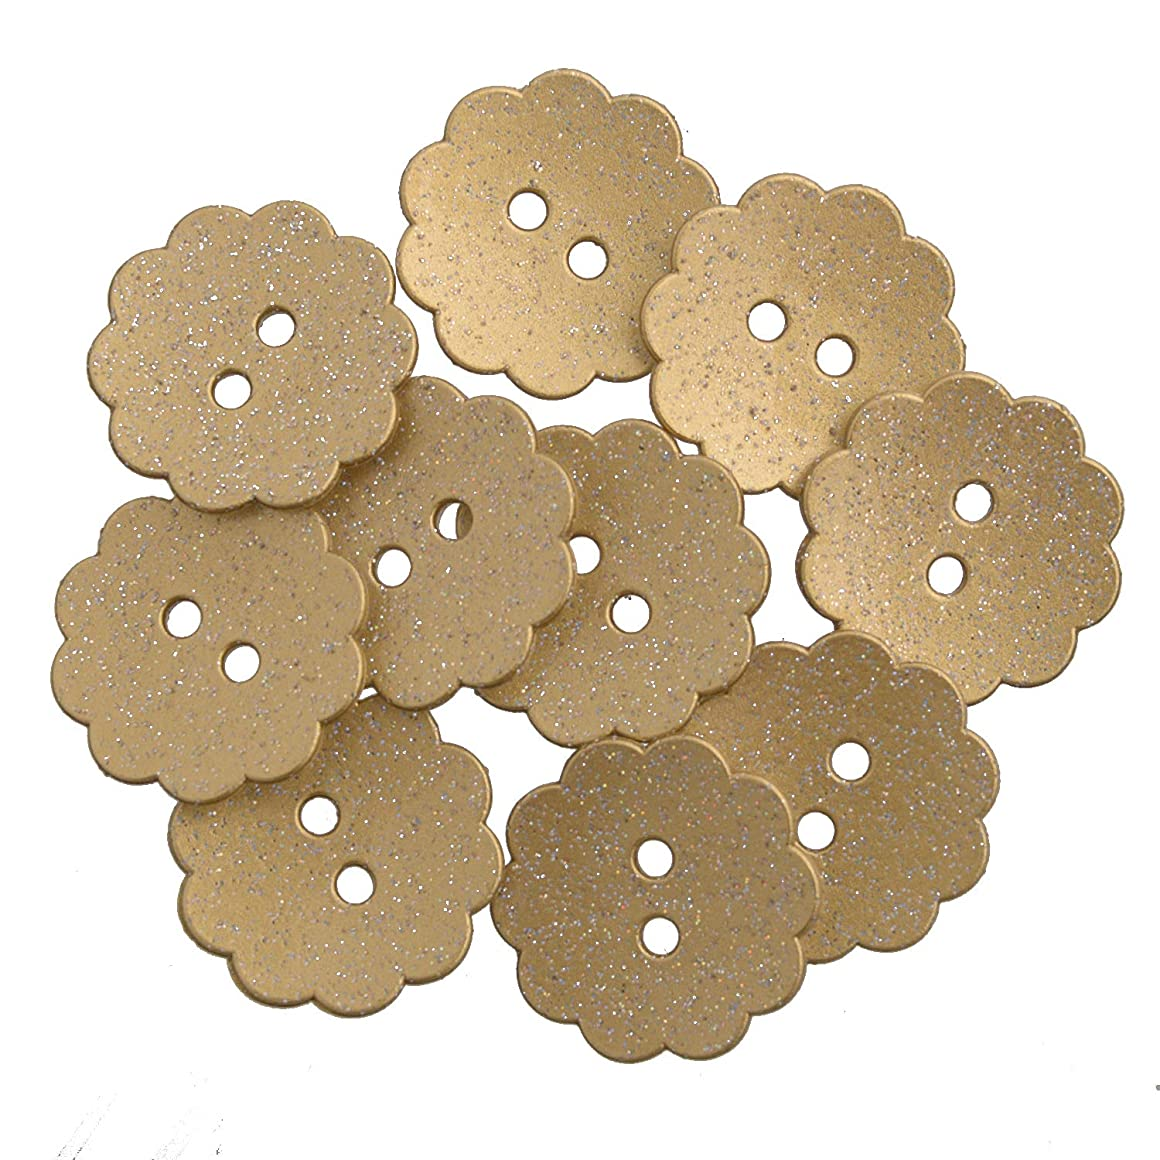 Nylon Resin - Daisy Shape - Festive Holiday Button - 28 Line - 2 Hole - Gold Glitter